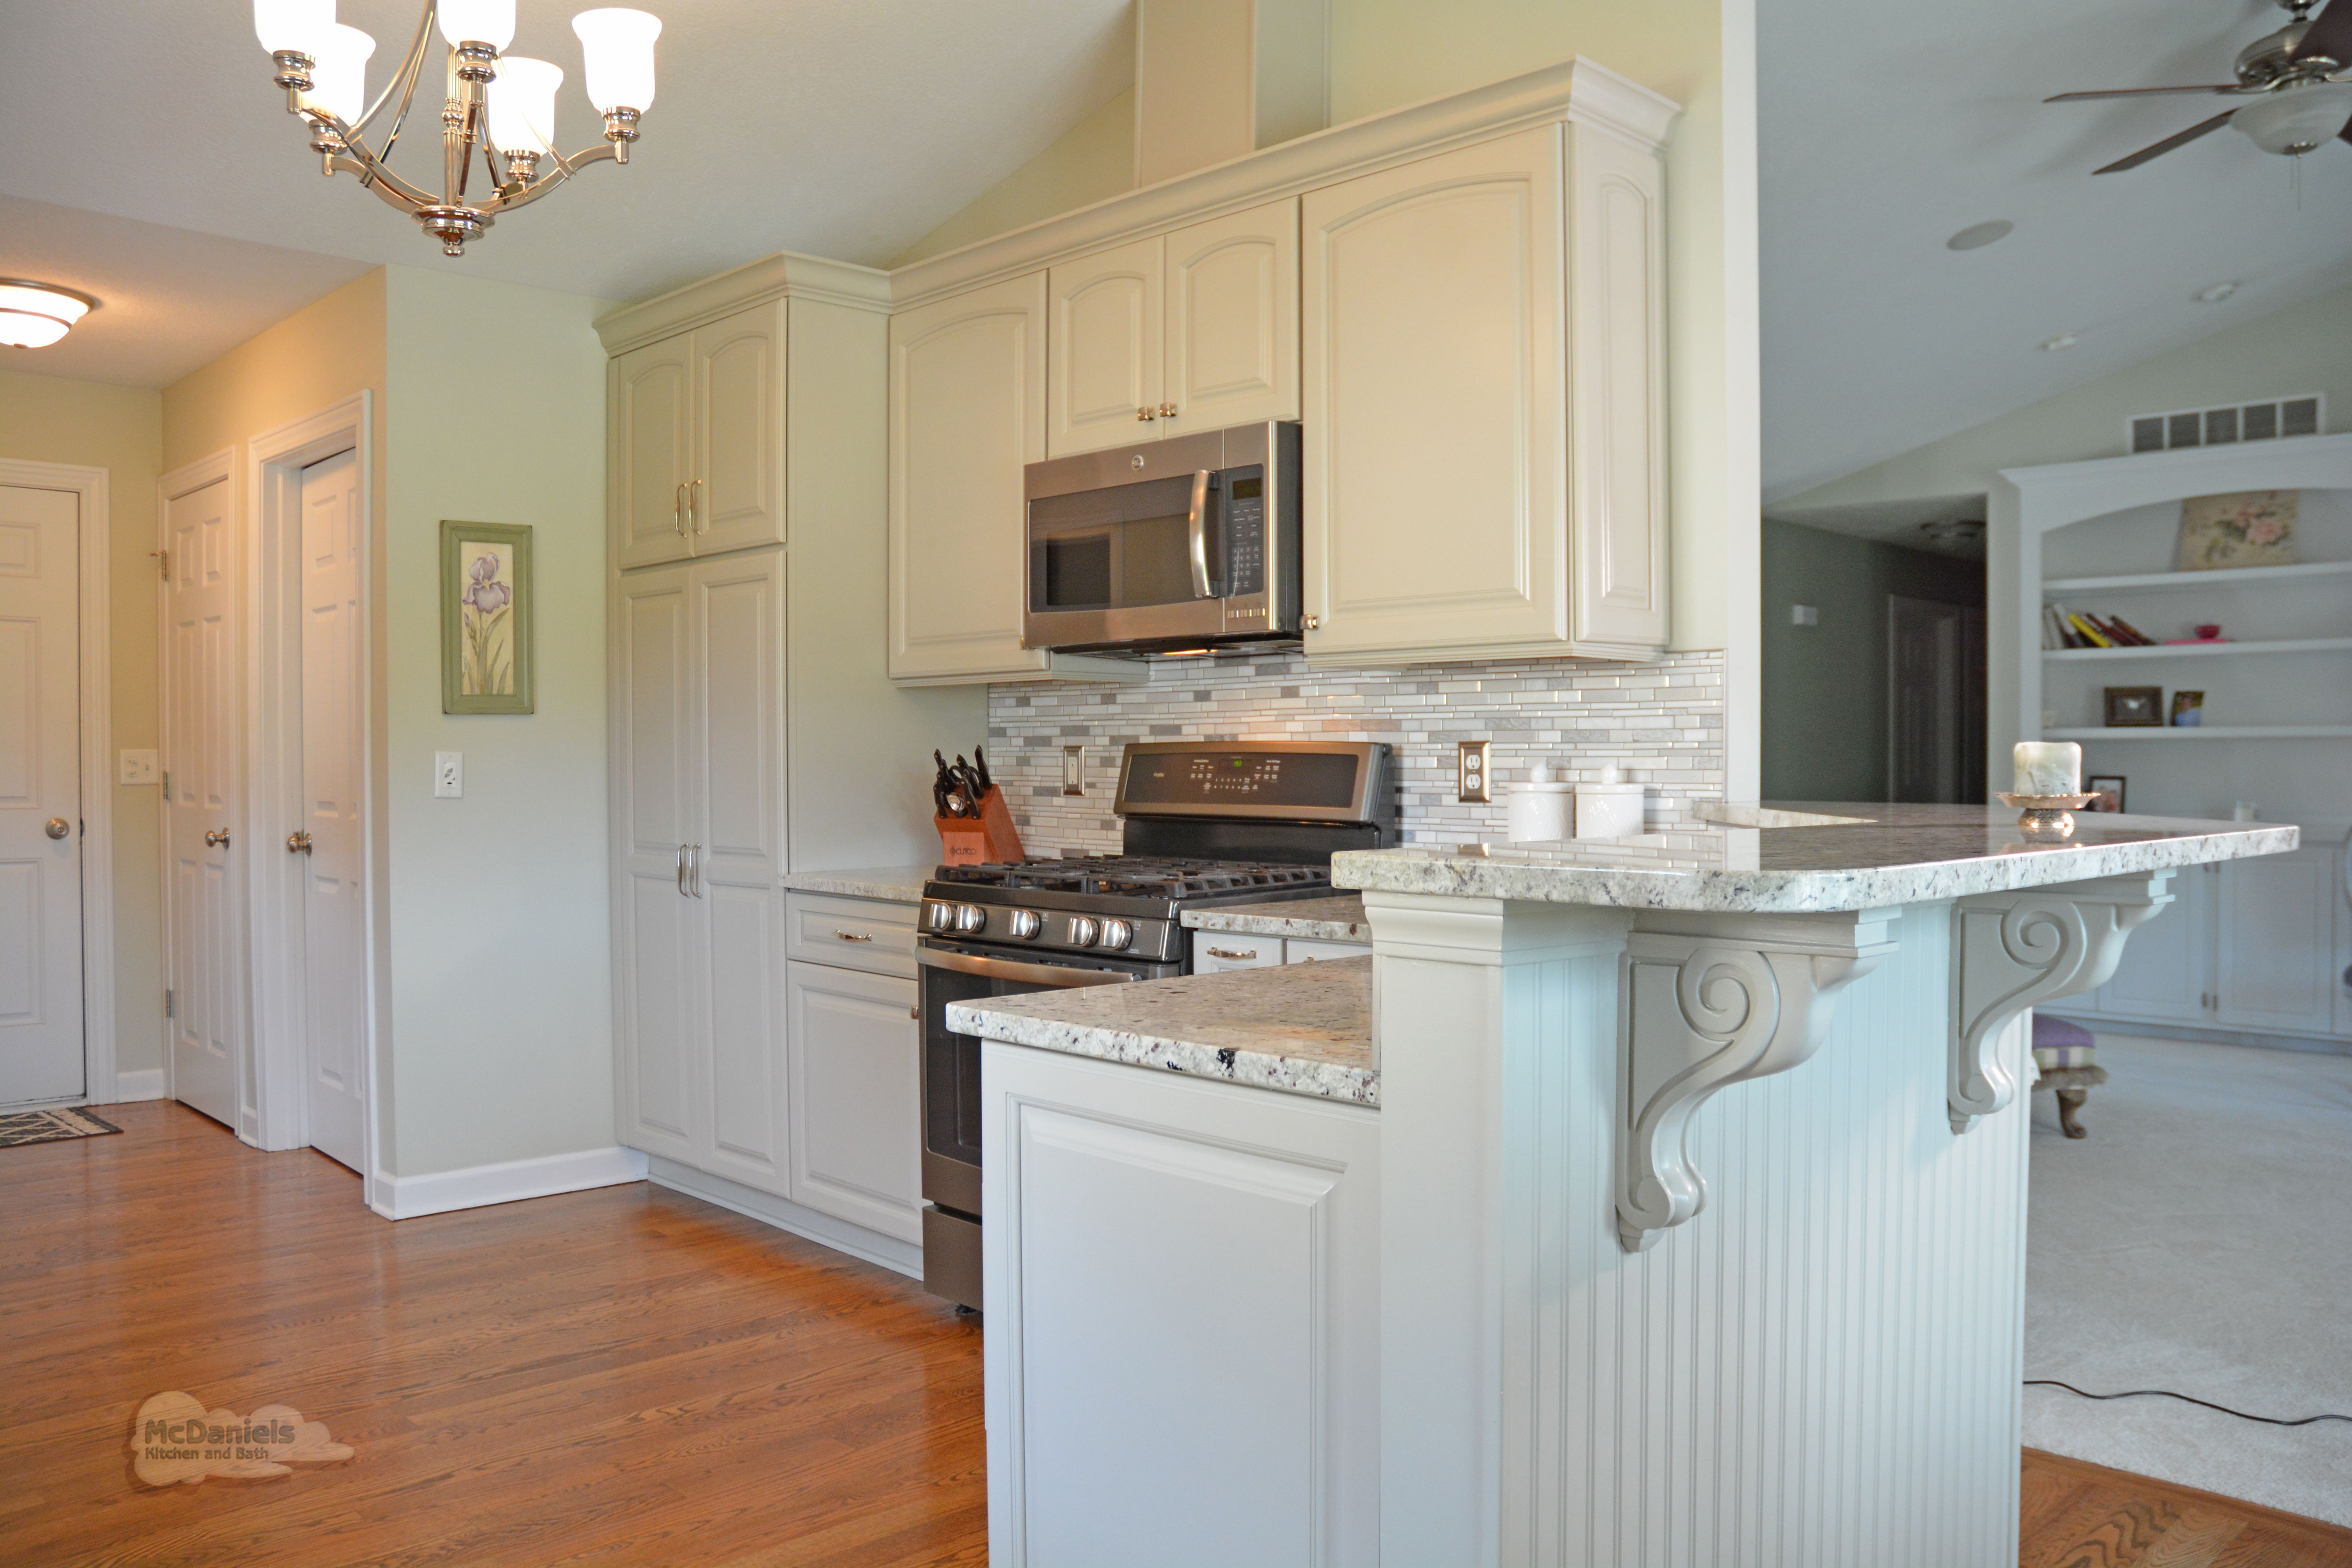 Local Kitchen Bathroom Design Remodeling Services Lansing Pa